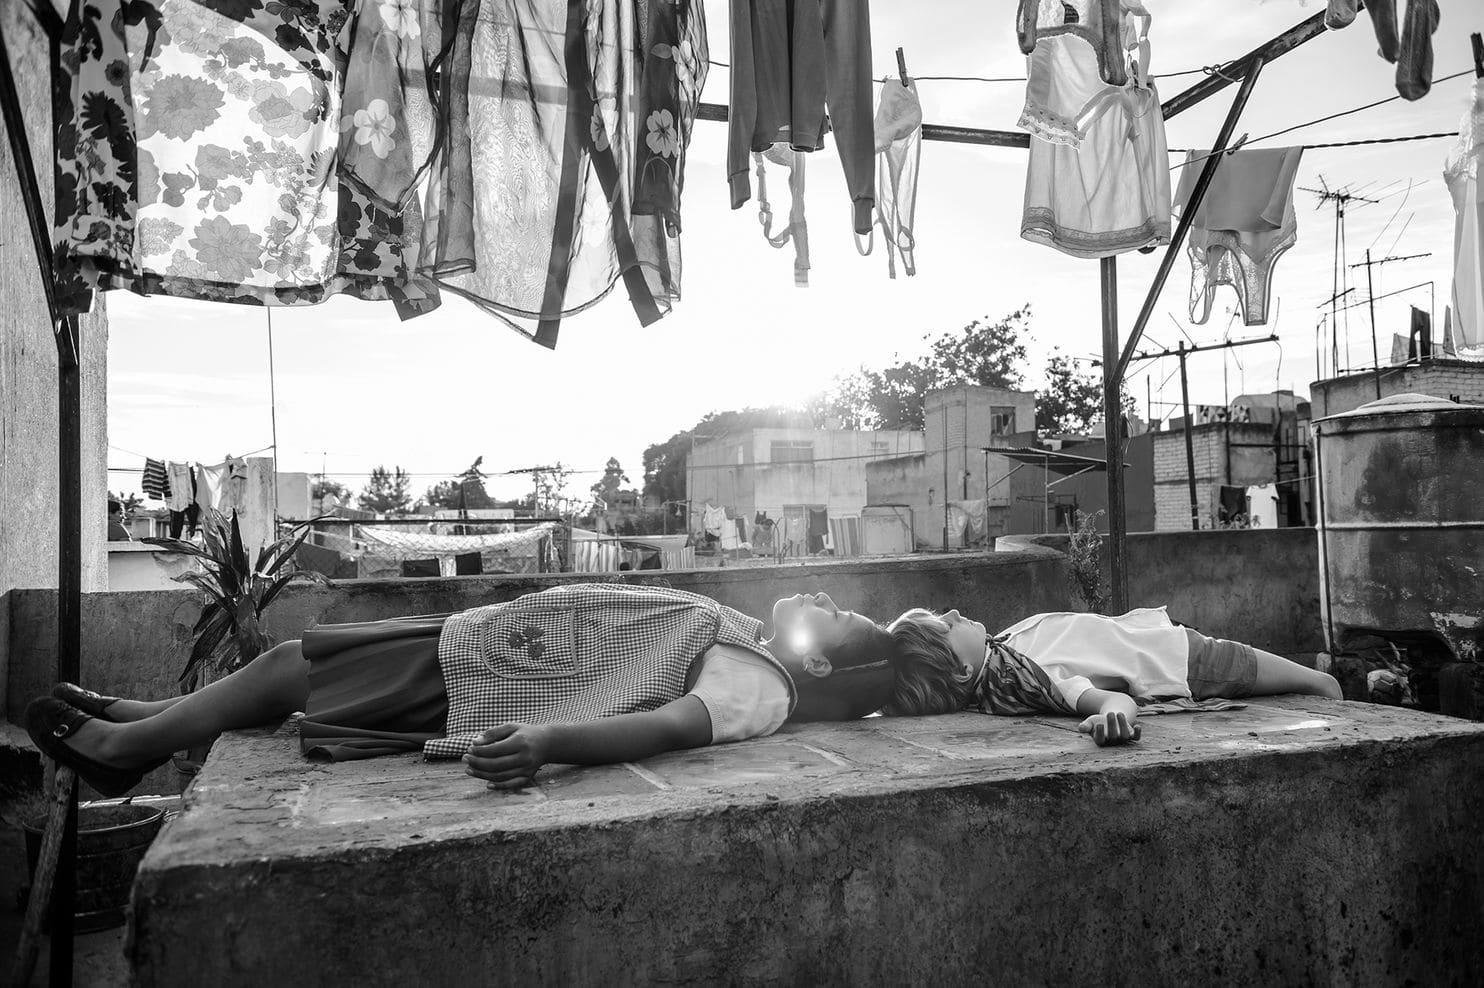 Roma – March Movie at Walton & Weybridge Film -A turbulent year in Mexico City